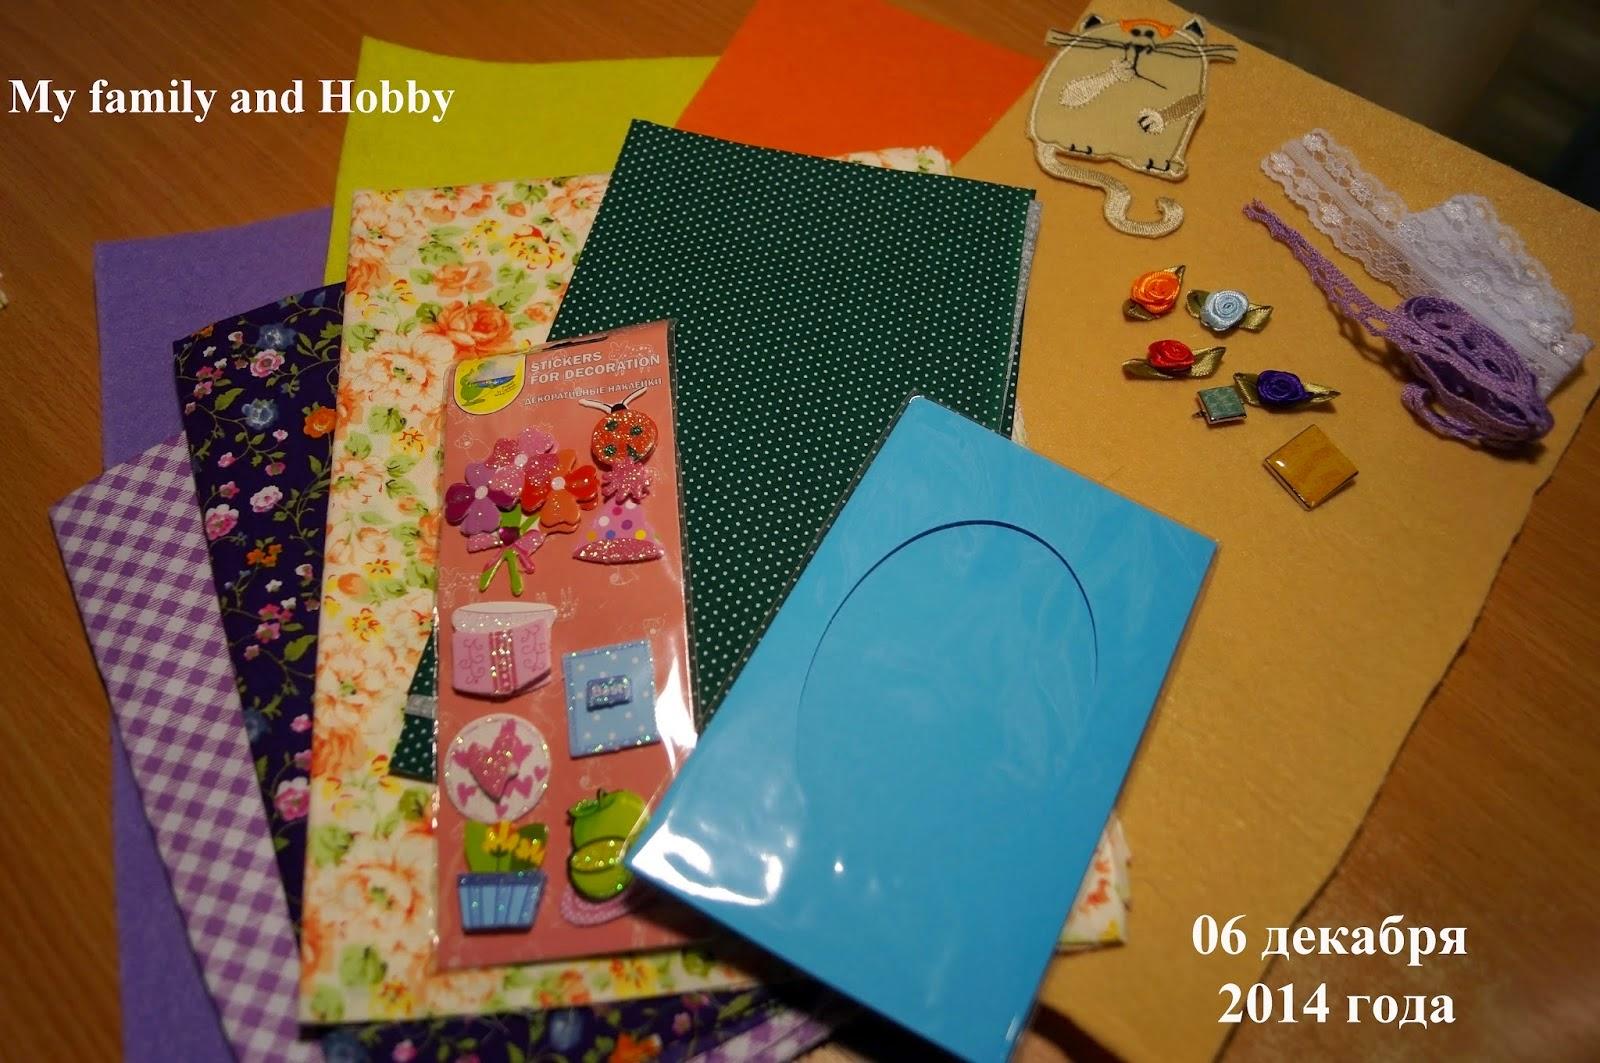 Моему блогу 3 года!!! Розыгрыш конфетки!!!